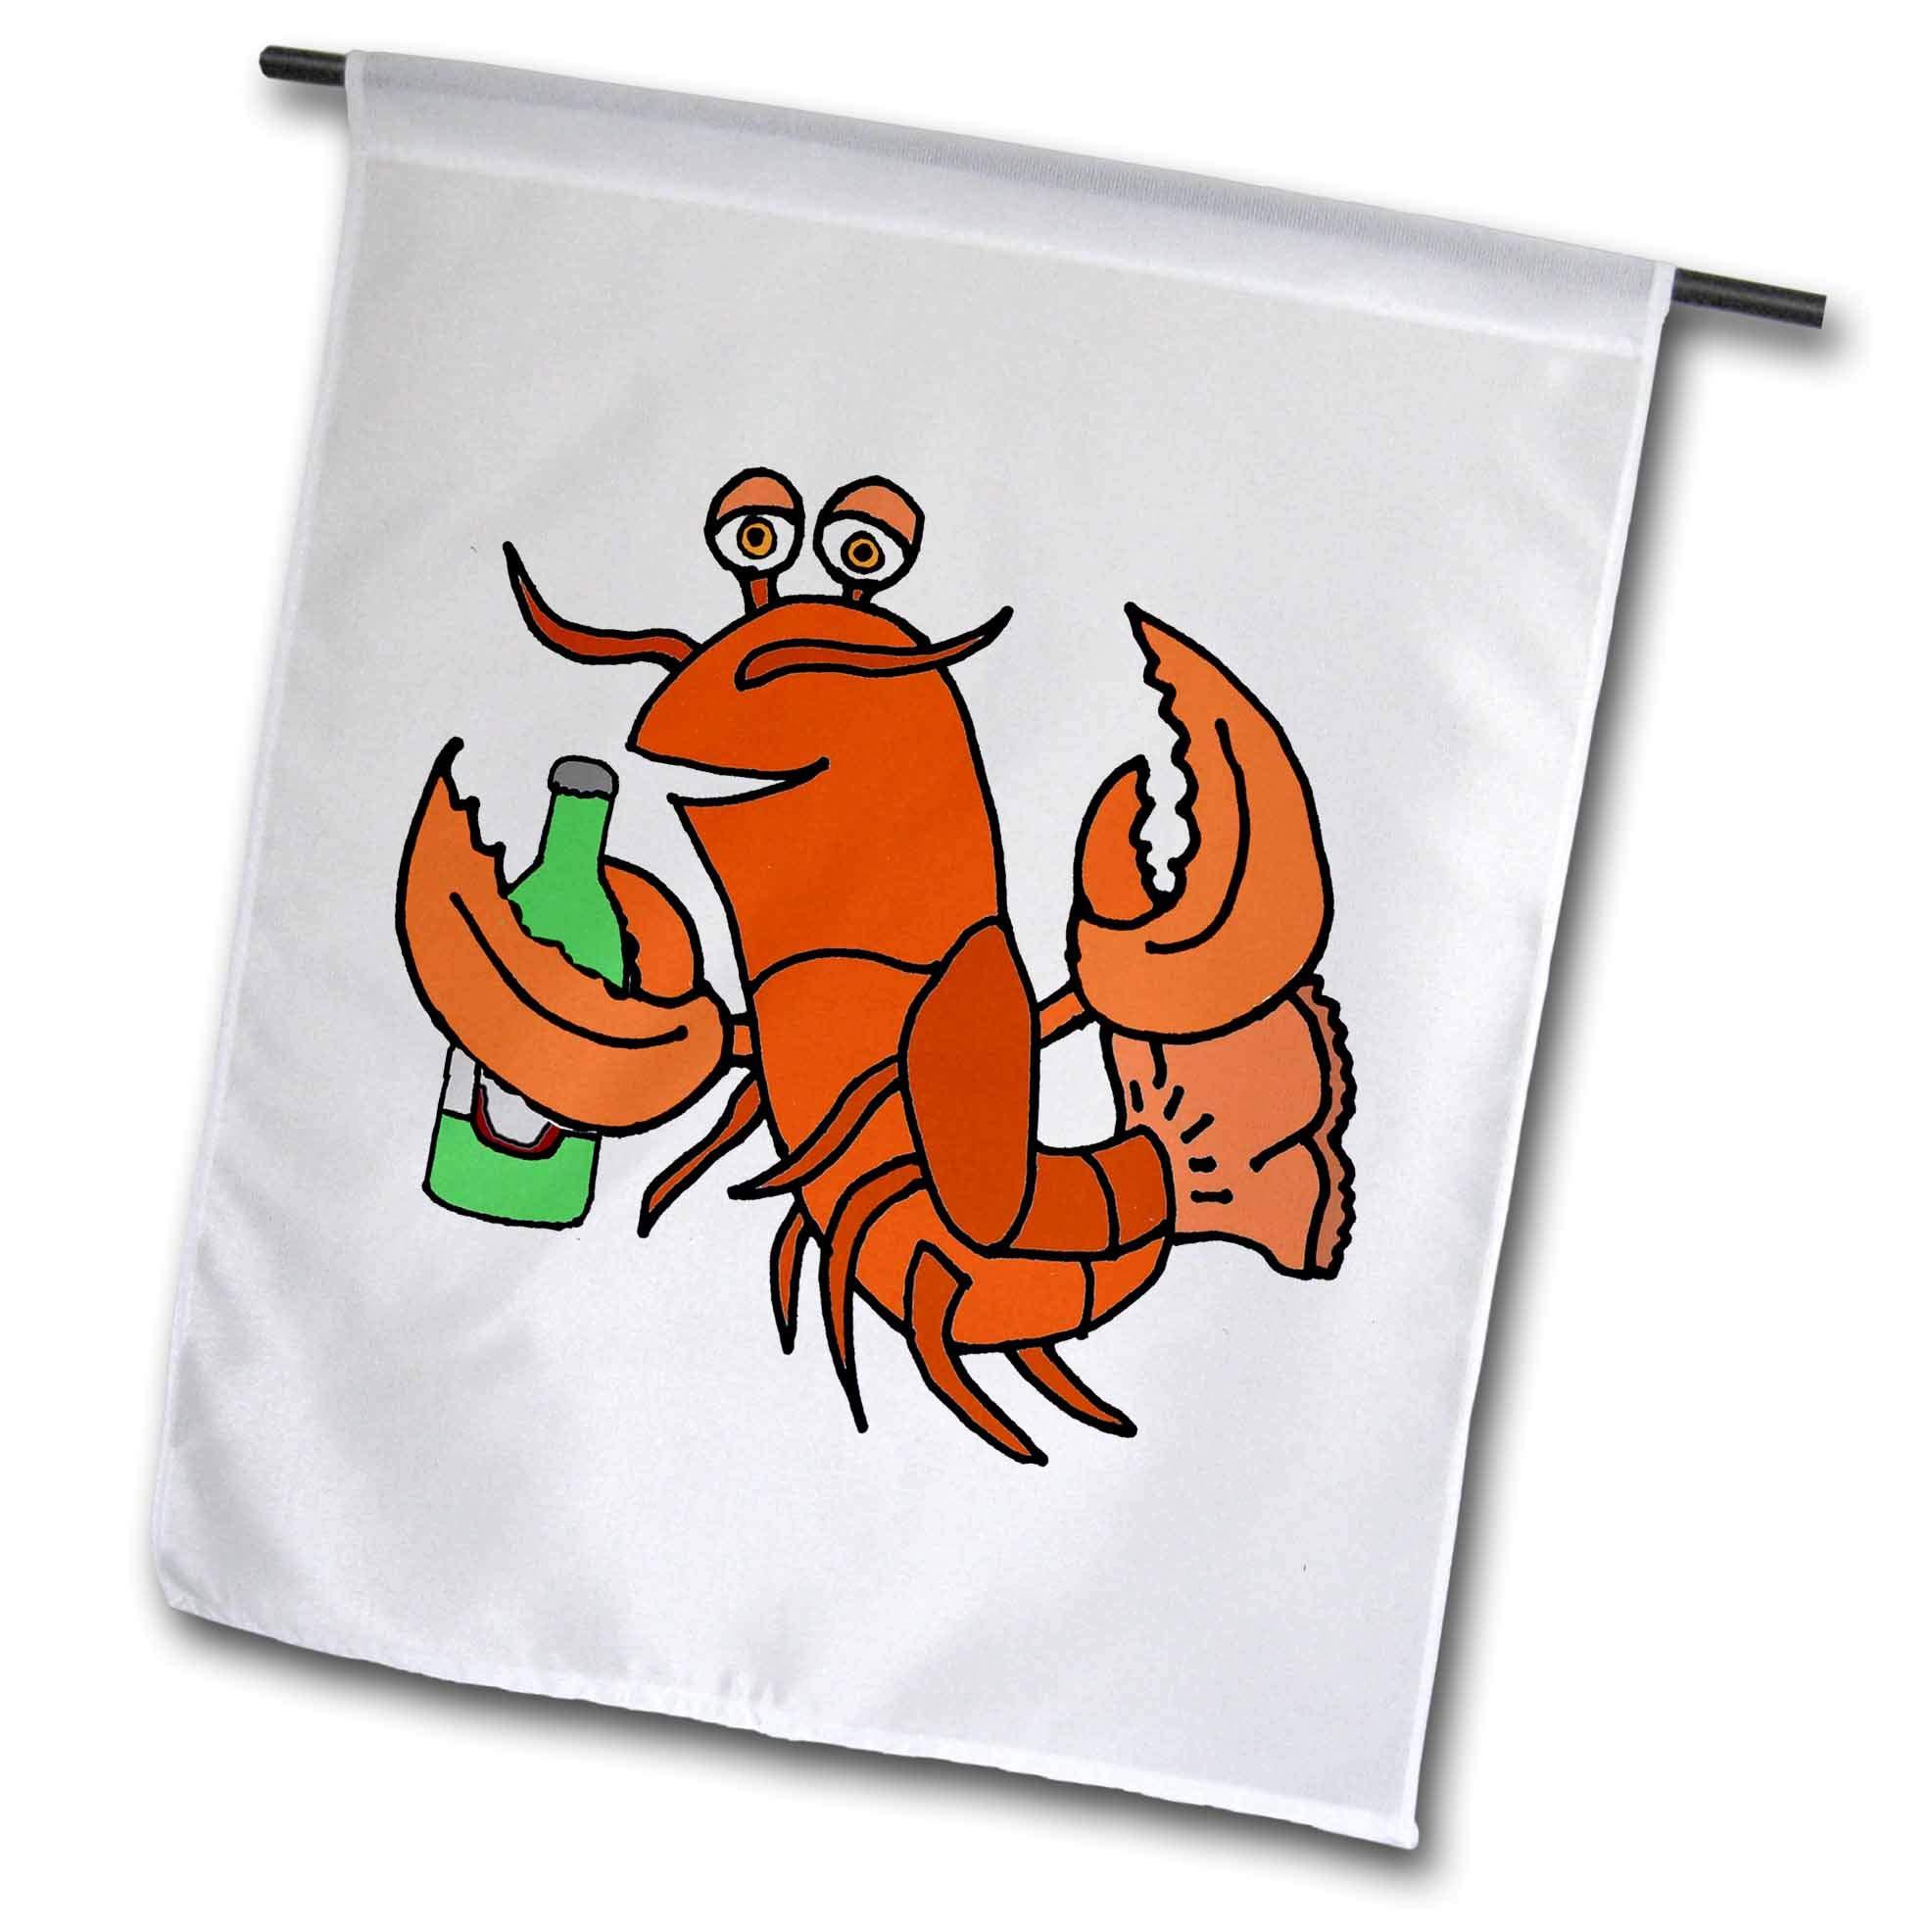 3dRose All Smiles Art Drinking - Cute Funny Lobster Drinking beer Beach Cartoon - 18 x 27 inch Garden Flag (fl_287995_2)